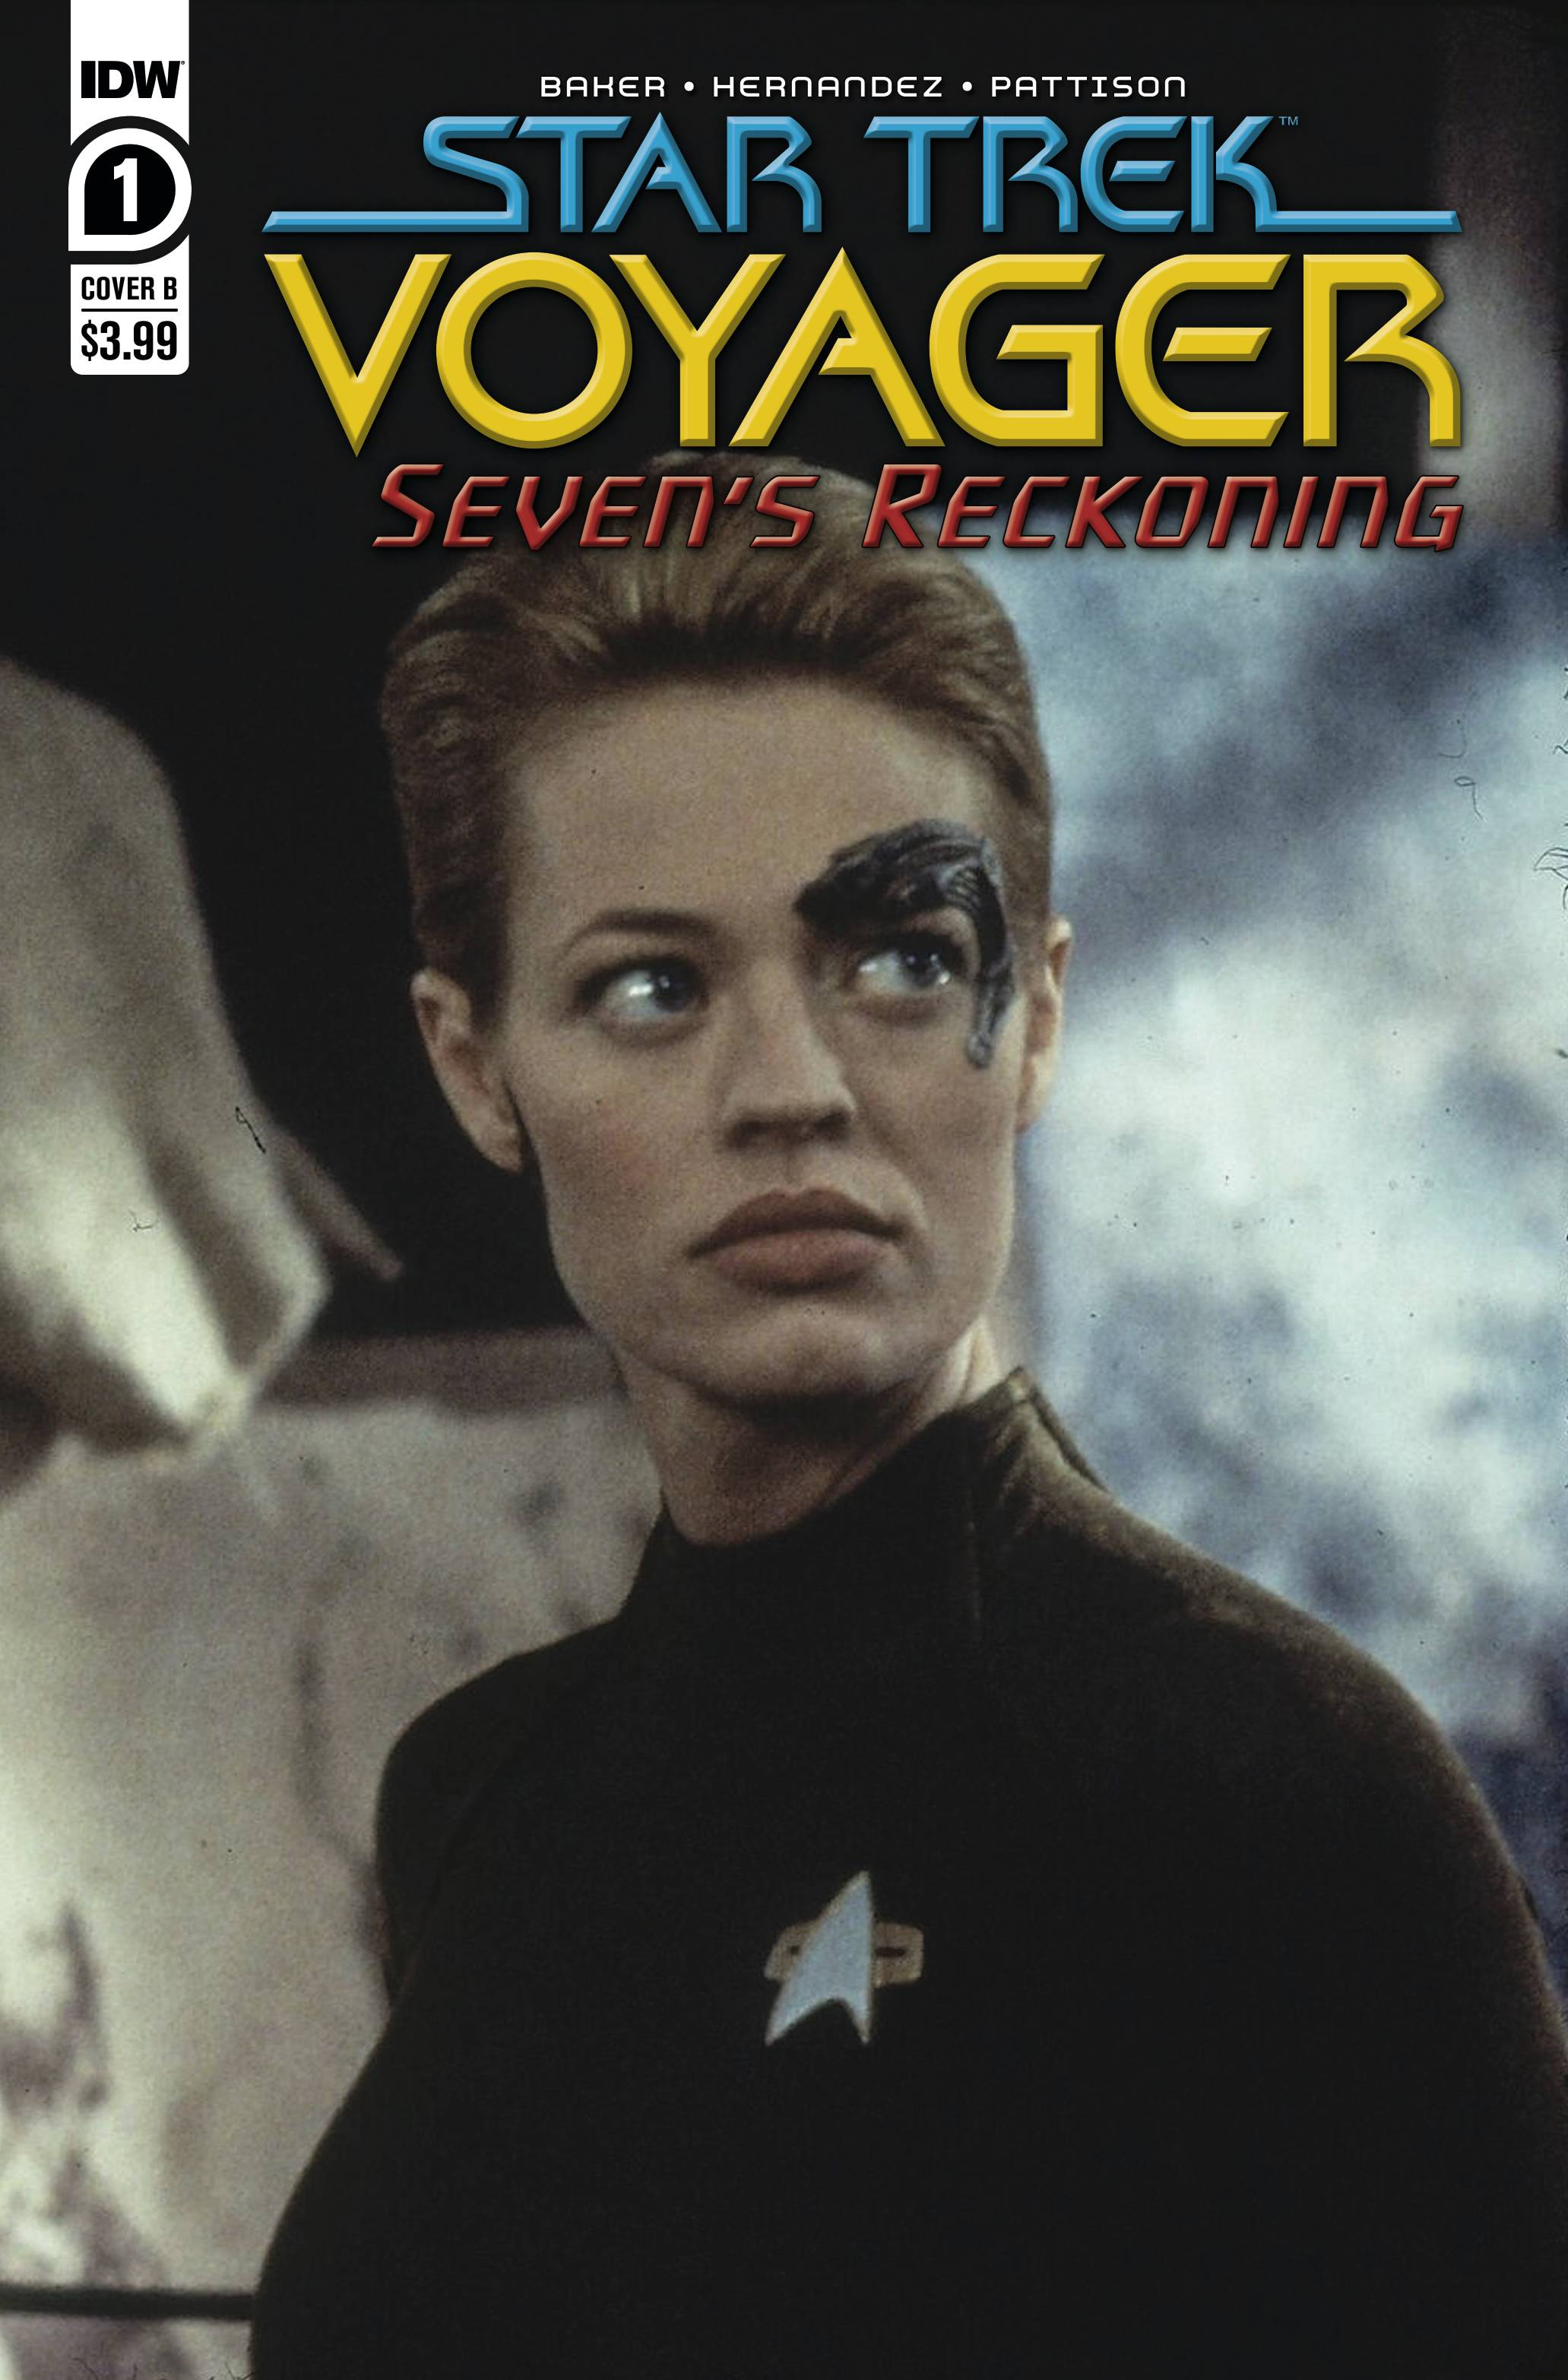 STAR TREK VOYAGER SEVENS RECKONING #1 (OF 4) CVR B PHOTO